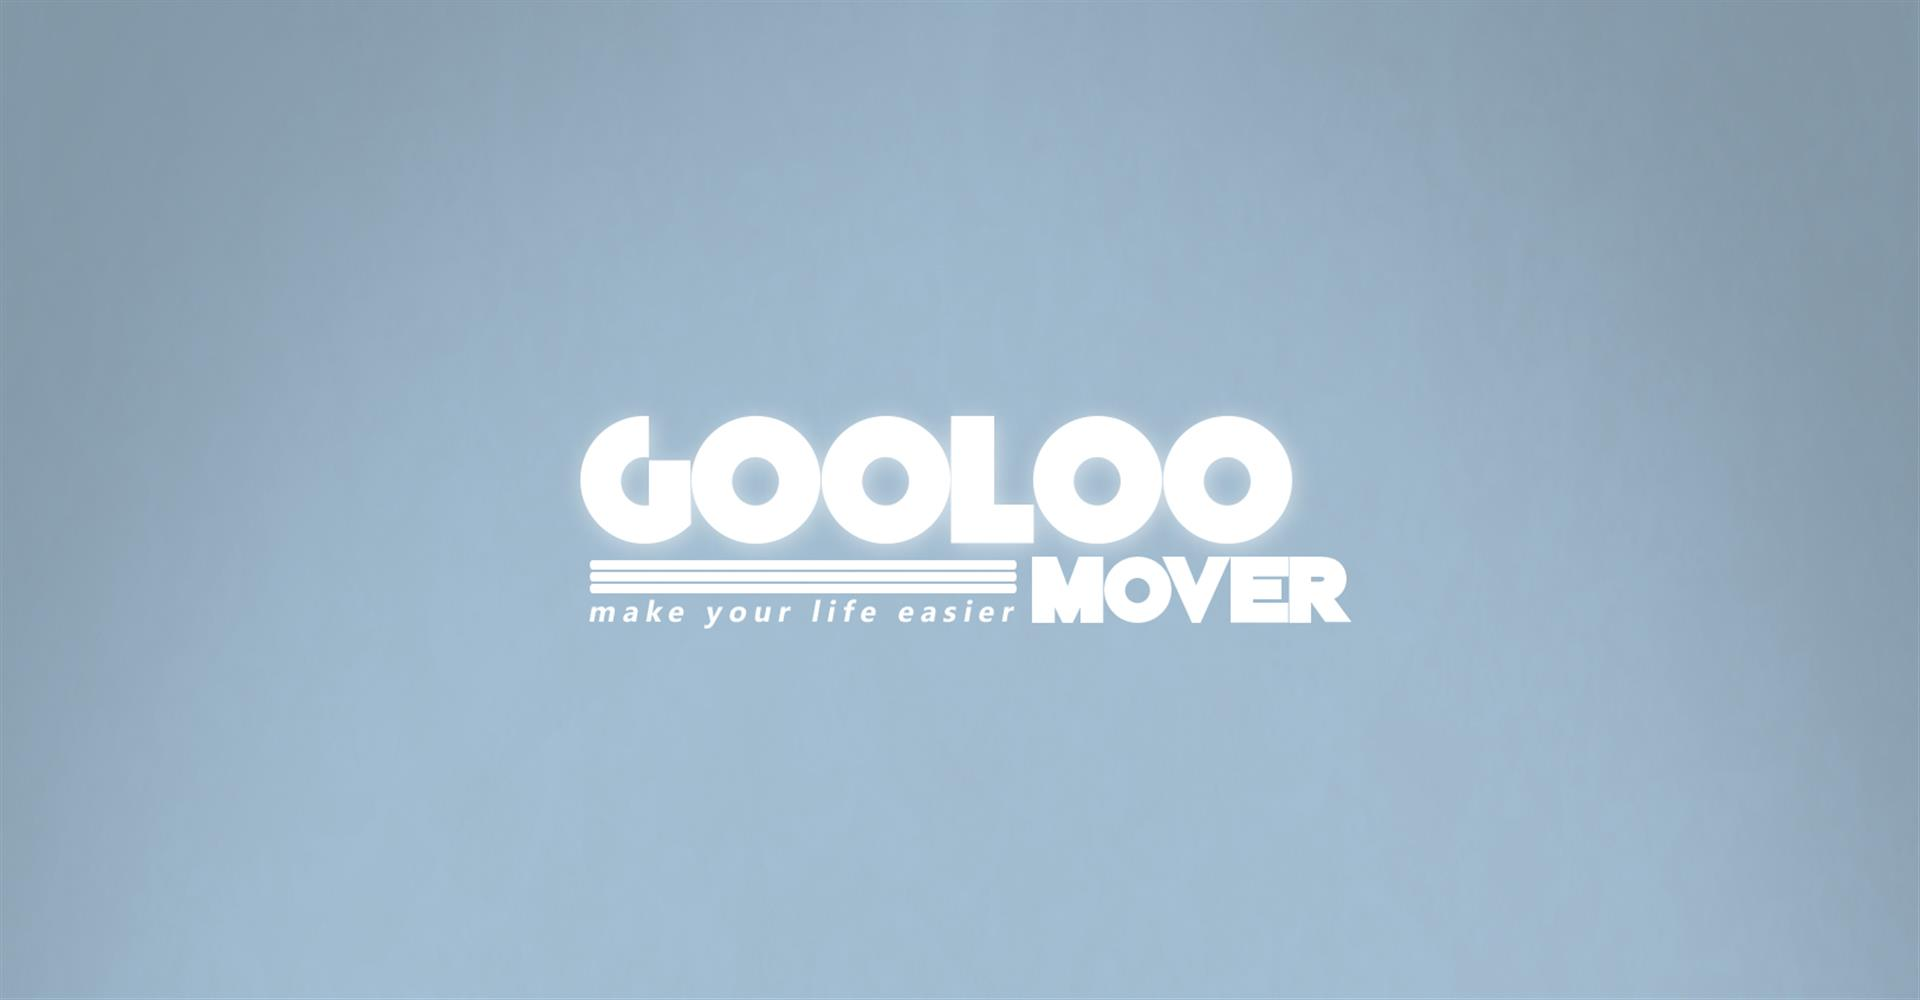 gooloo-mover logotype 2